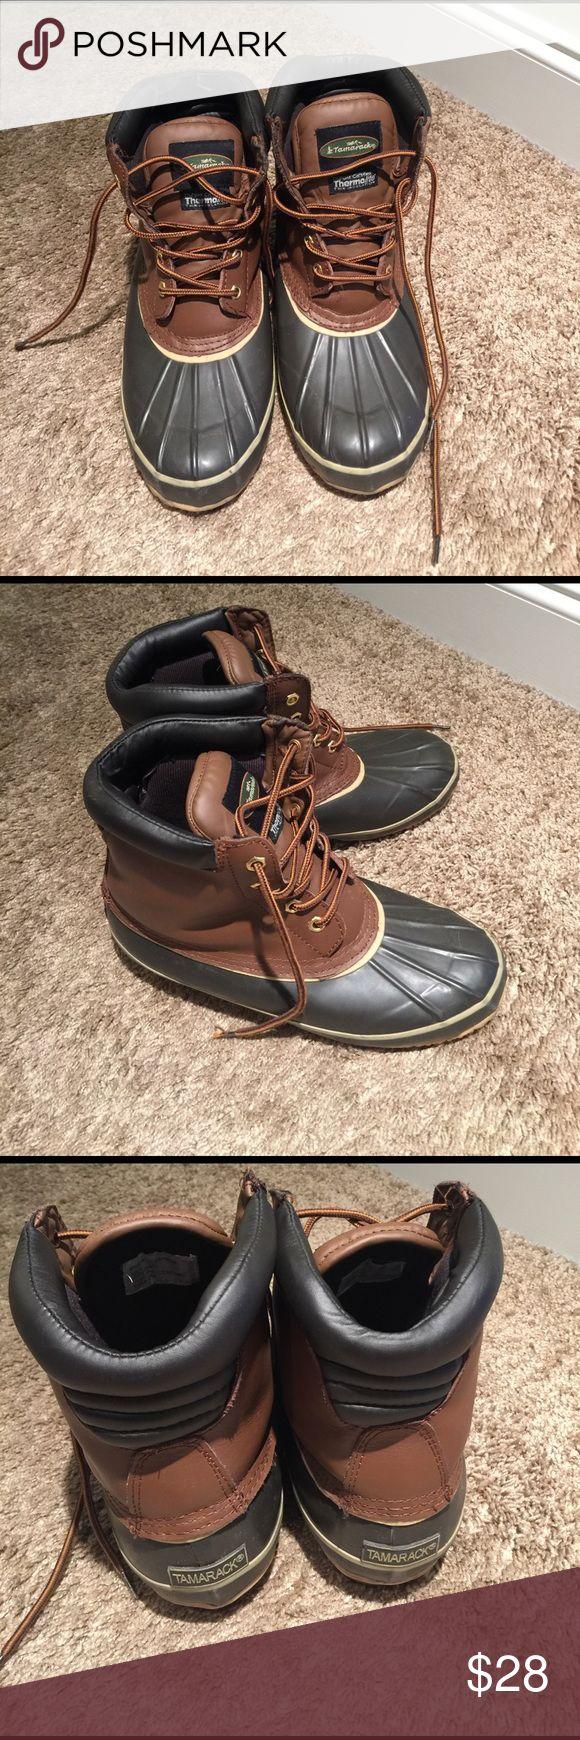 Tamarack Winter Duck Rain Boots Size 9 Thermolite Men's Tamarack Duck Boots Size 9.  These are DuPont certified Thermalite Thin Insulation Boots. Tamarack Shoes Rain & Snow Boots